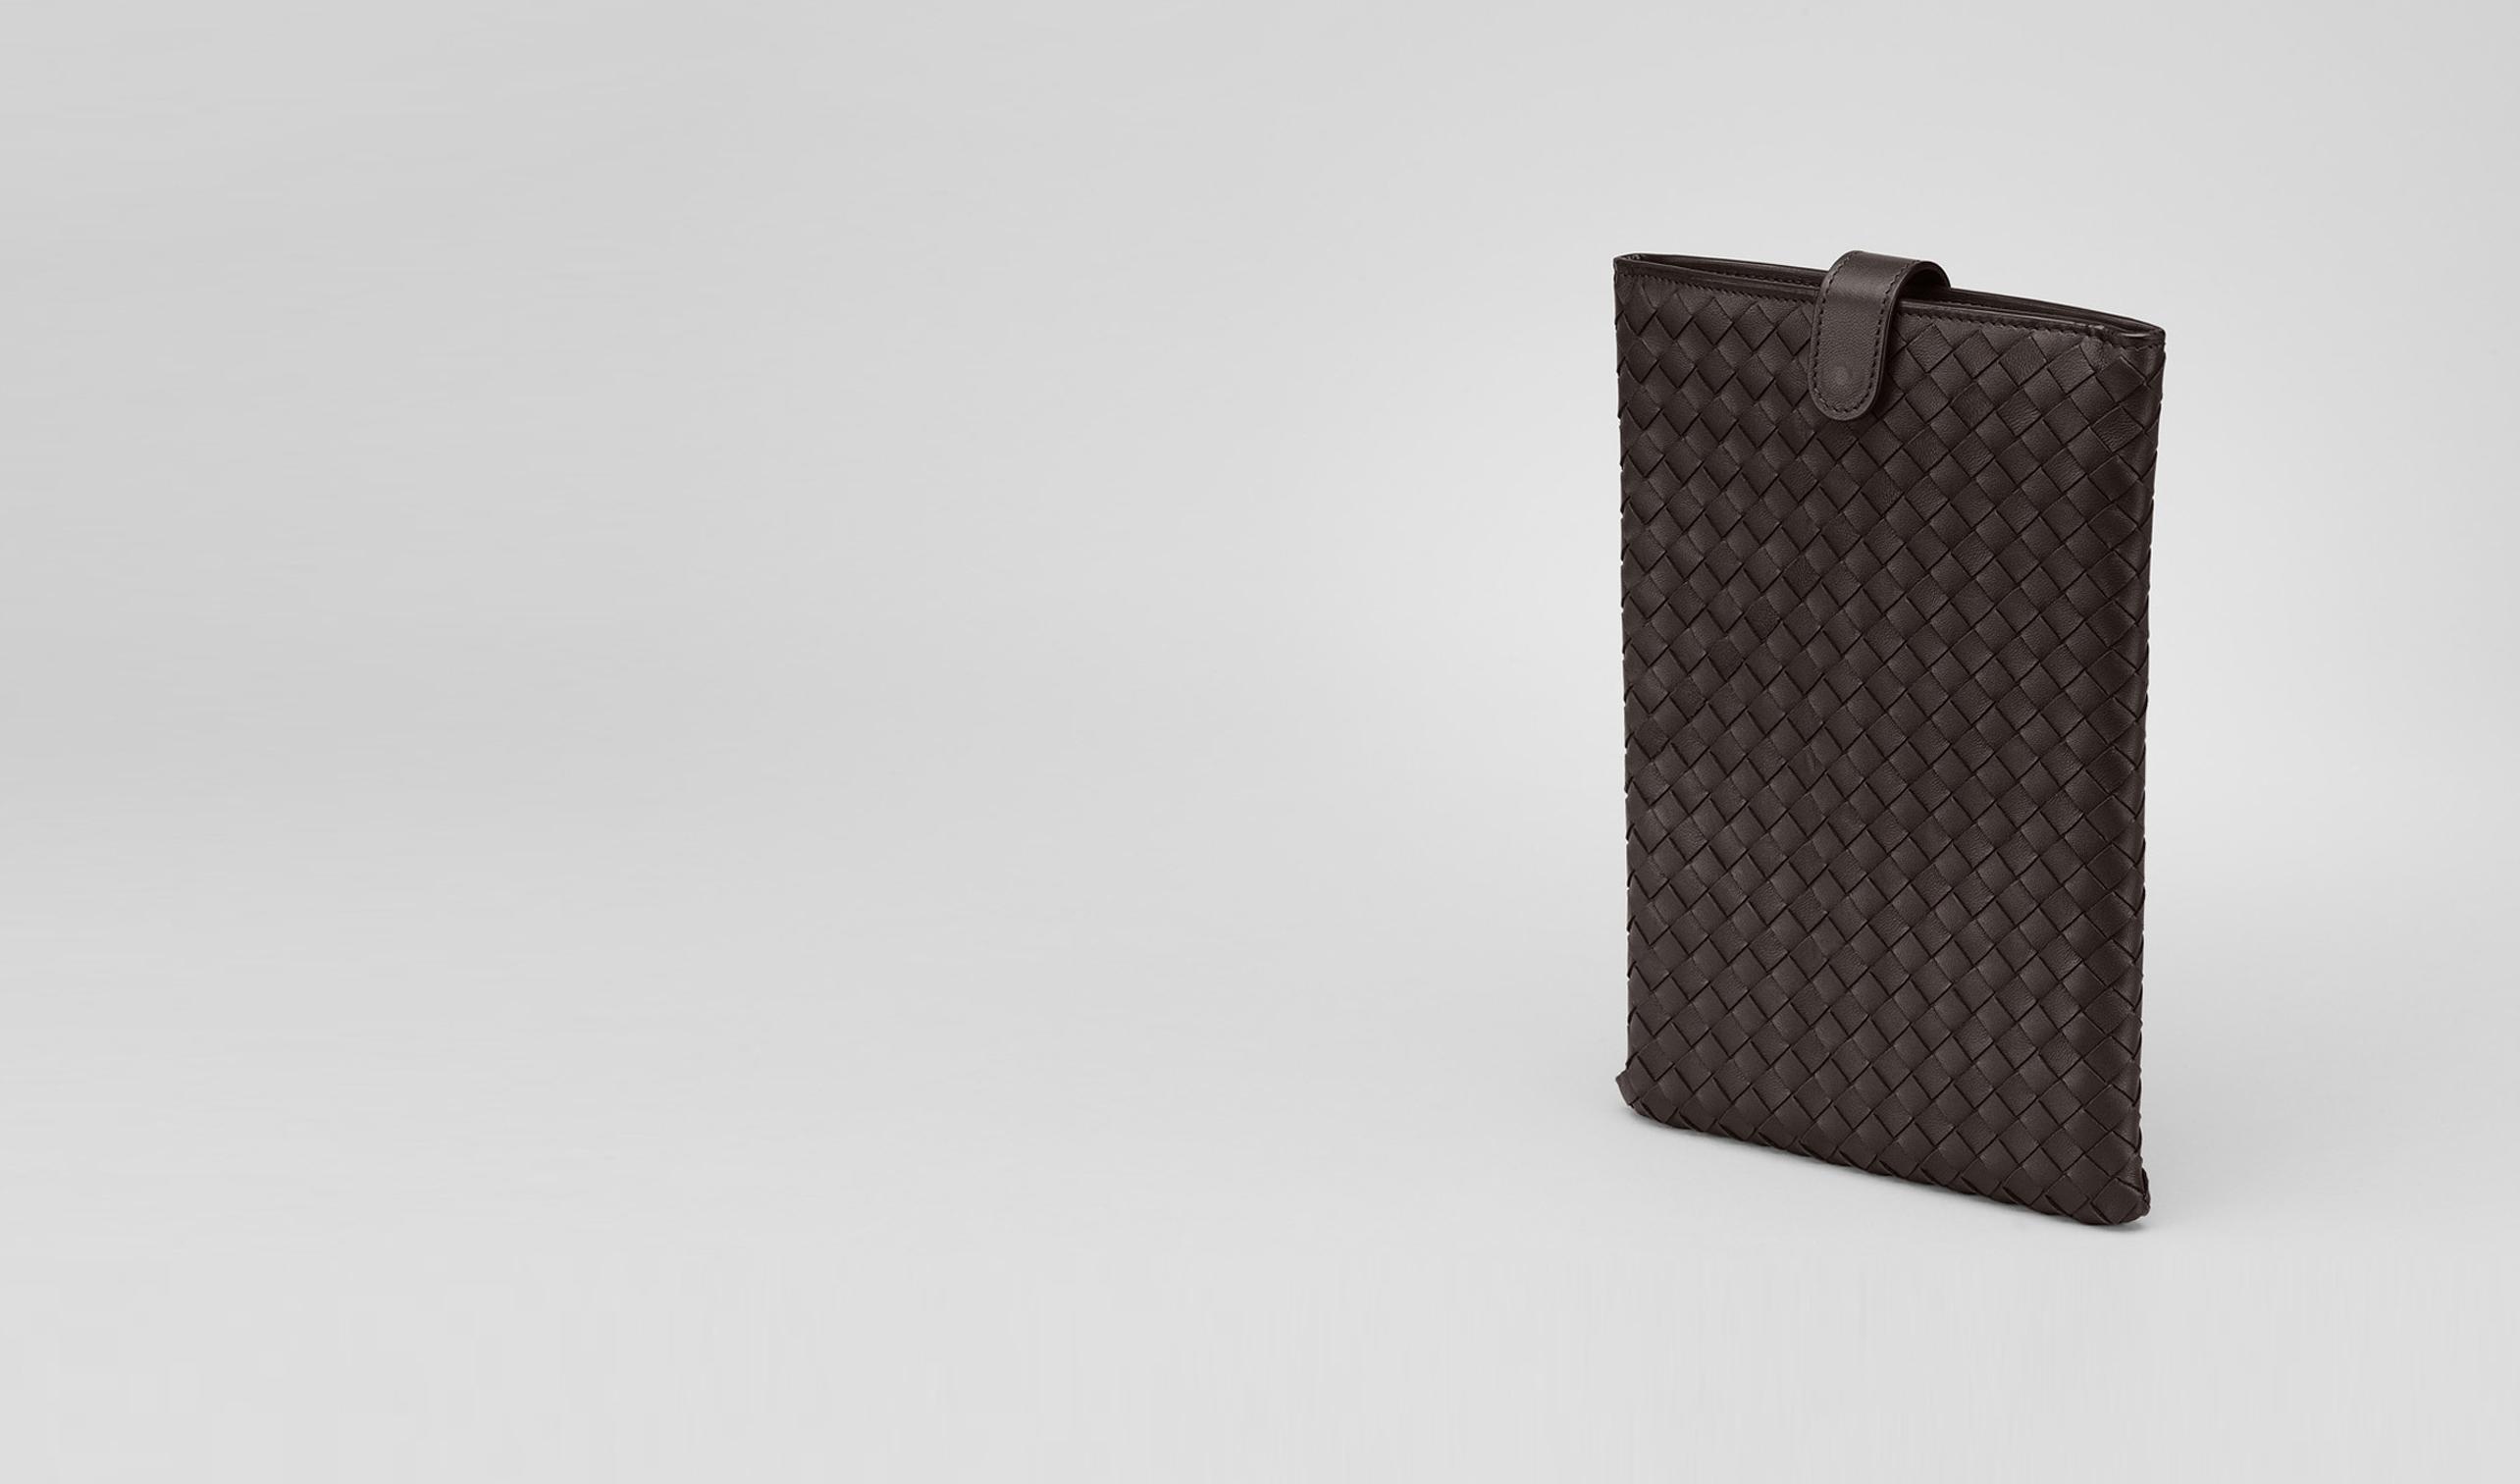 BOTTEGA VENETA Weiteres Leder Accessoire E iPad mini Hülle aus Nappaleder Intrecciato Ebano pl